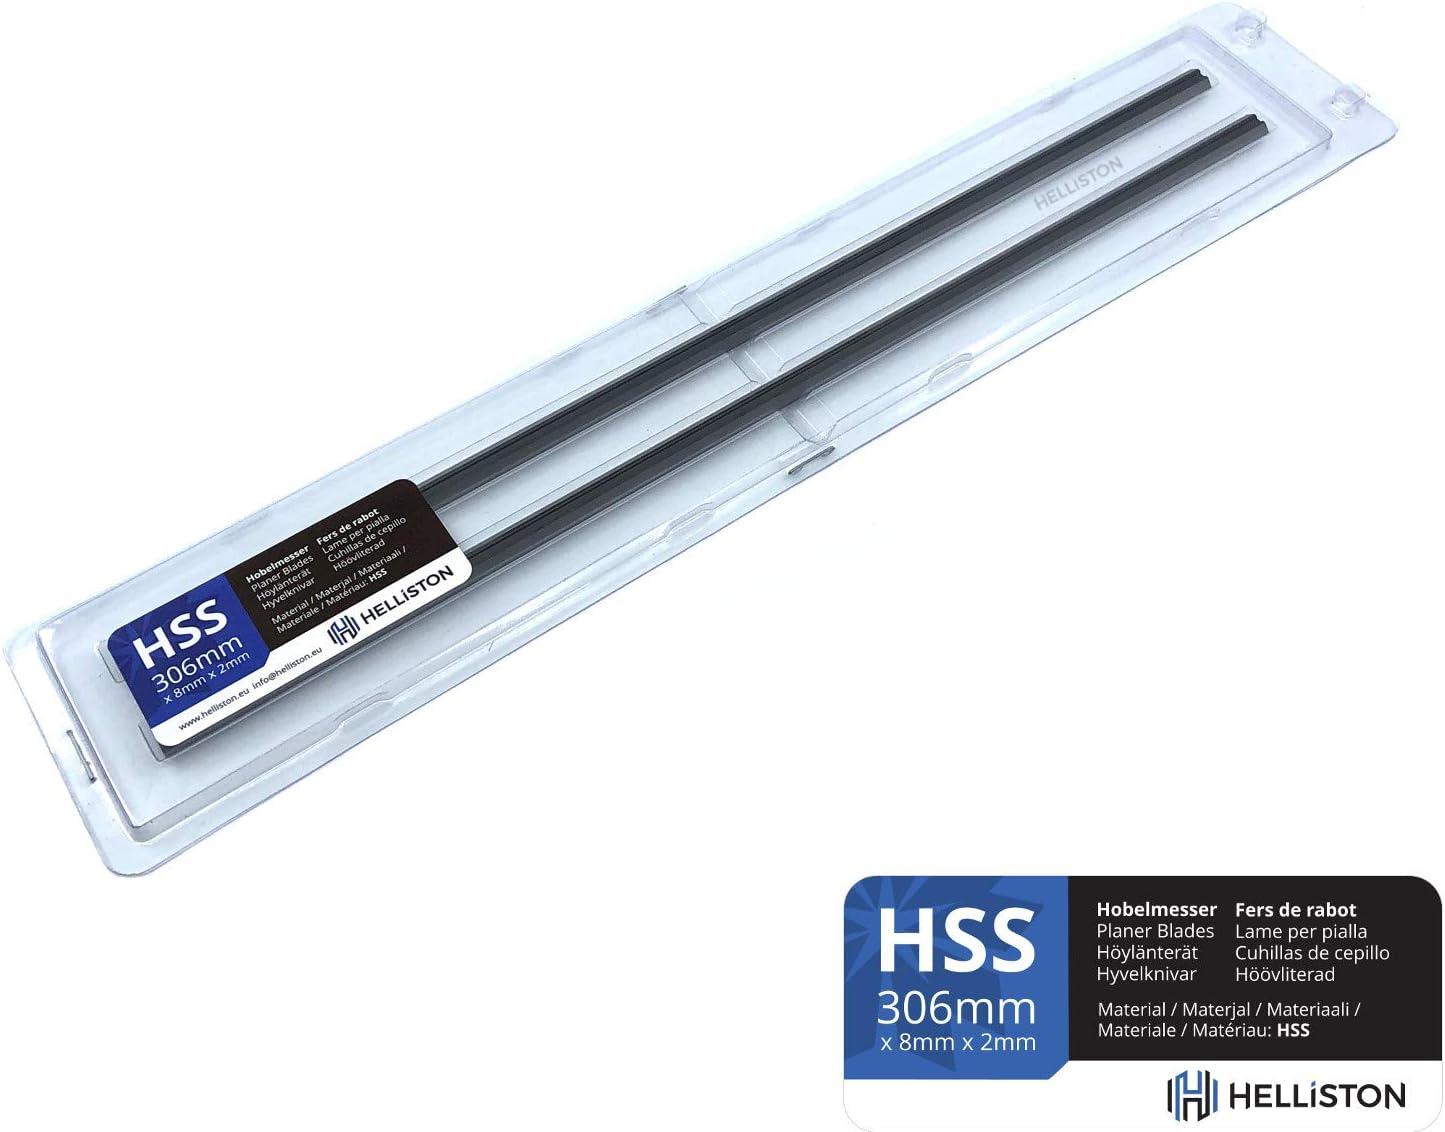 HSS Hobelmesser 2012NB Wendemesser 306mm f/ür Makita 2012 2 Satz = 4 Hobelmesser